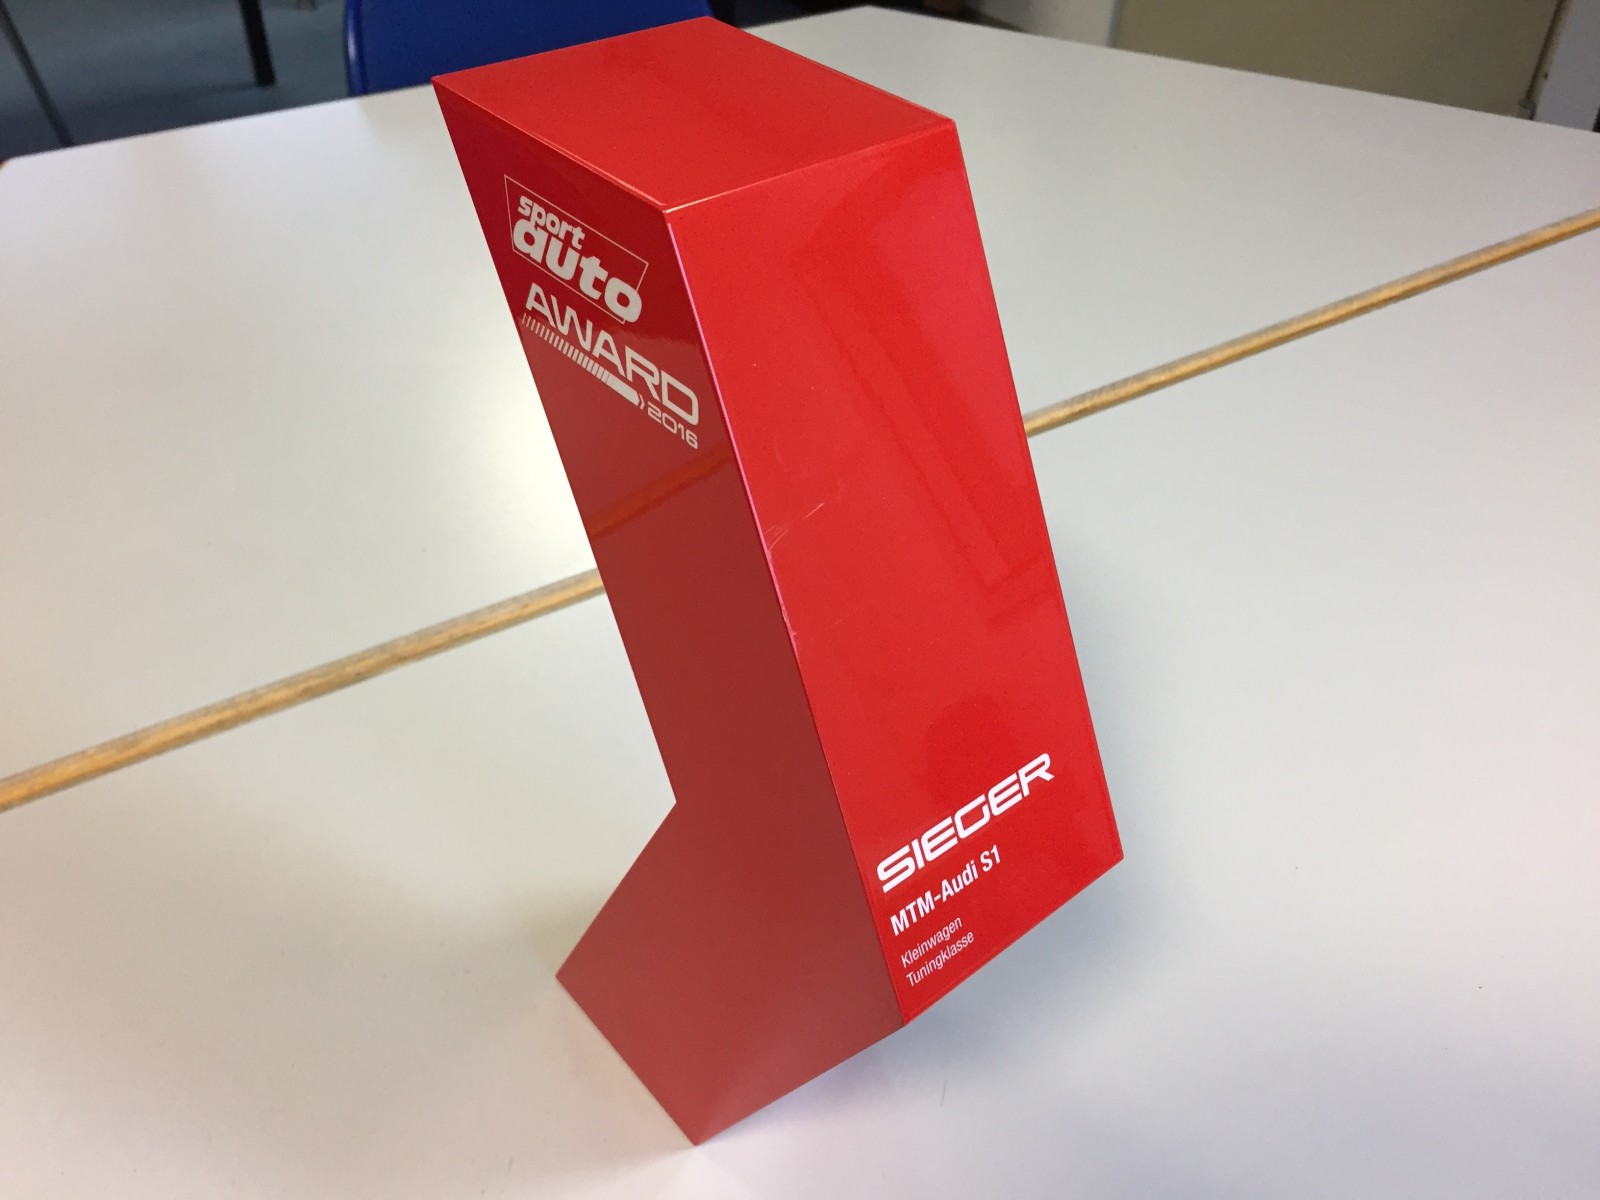 sport-auto-award-2016-s1-2_i85821920x1200_37_225